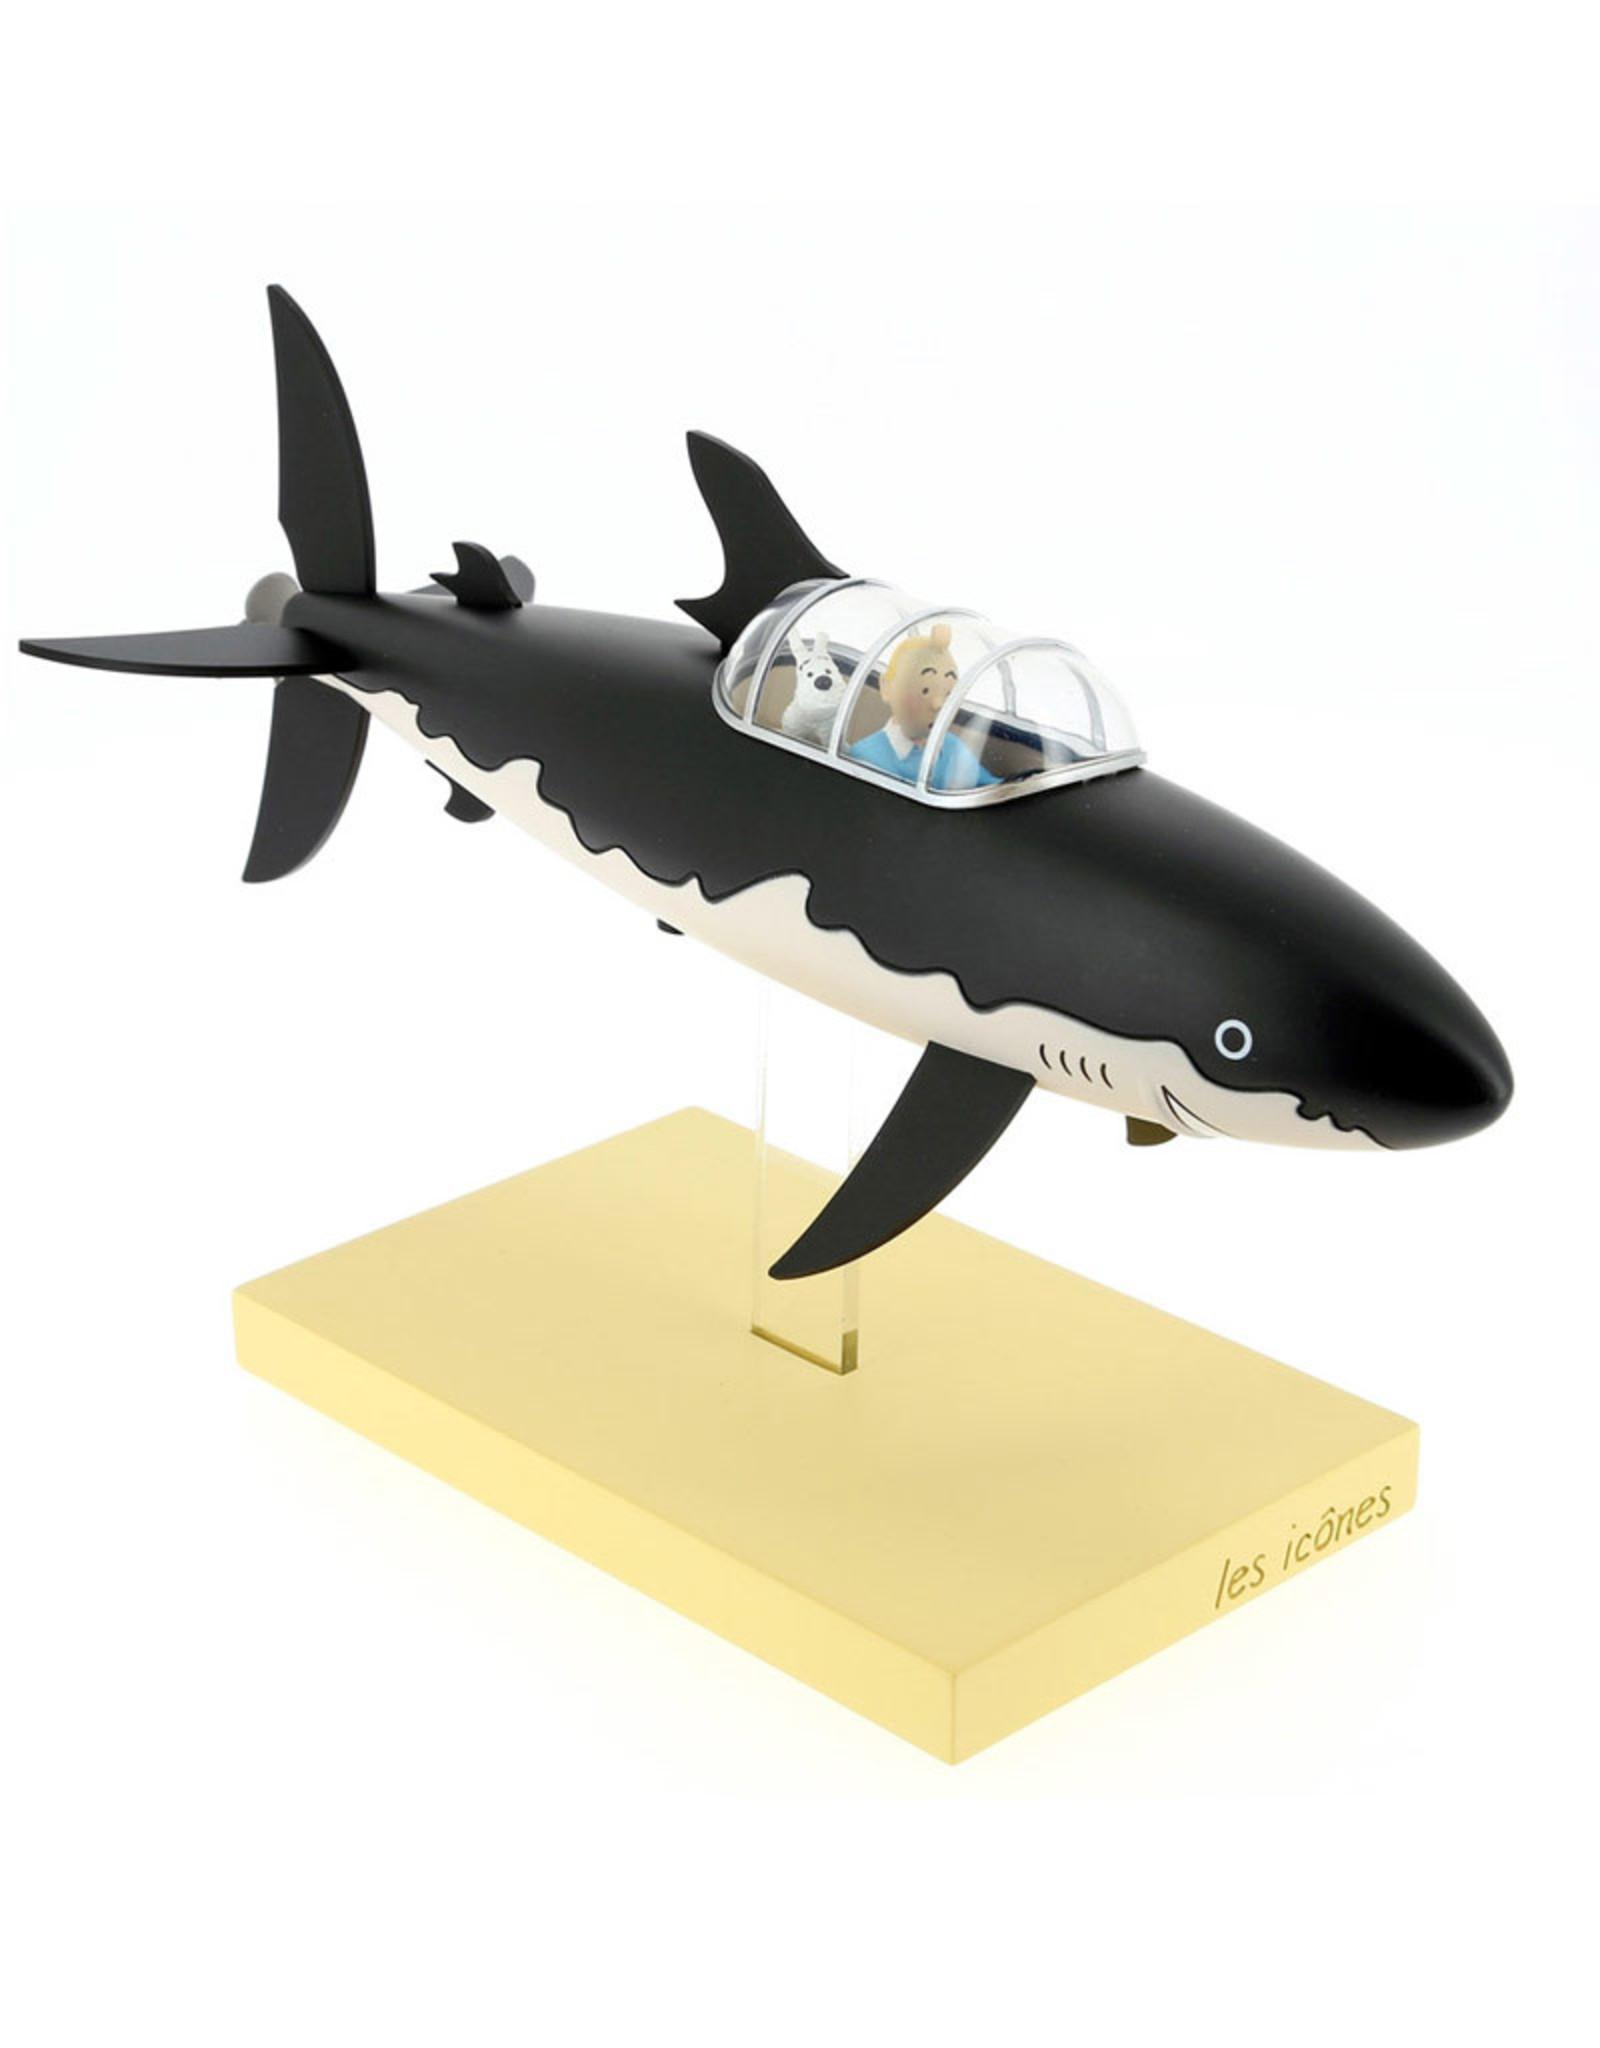 Tintin Tintin ( Collection Les Icônes ) Sous-Marin Requin